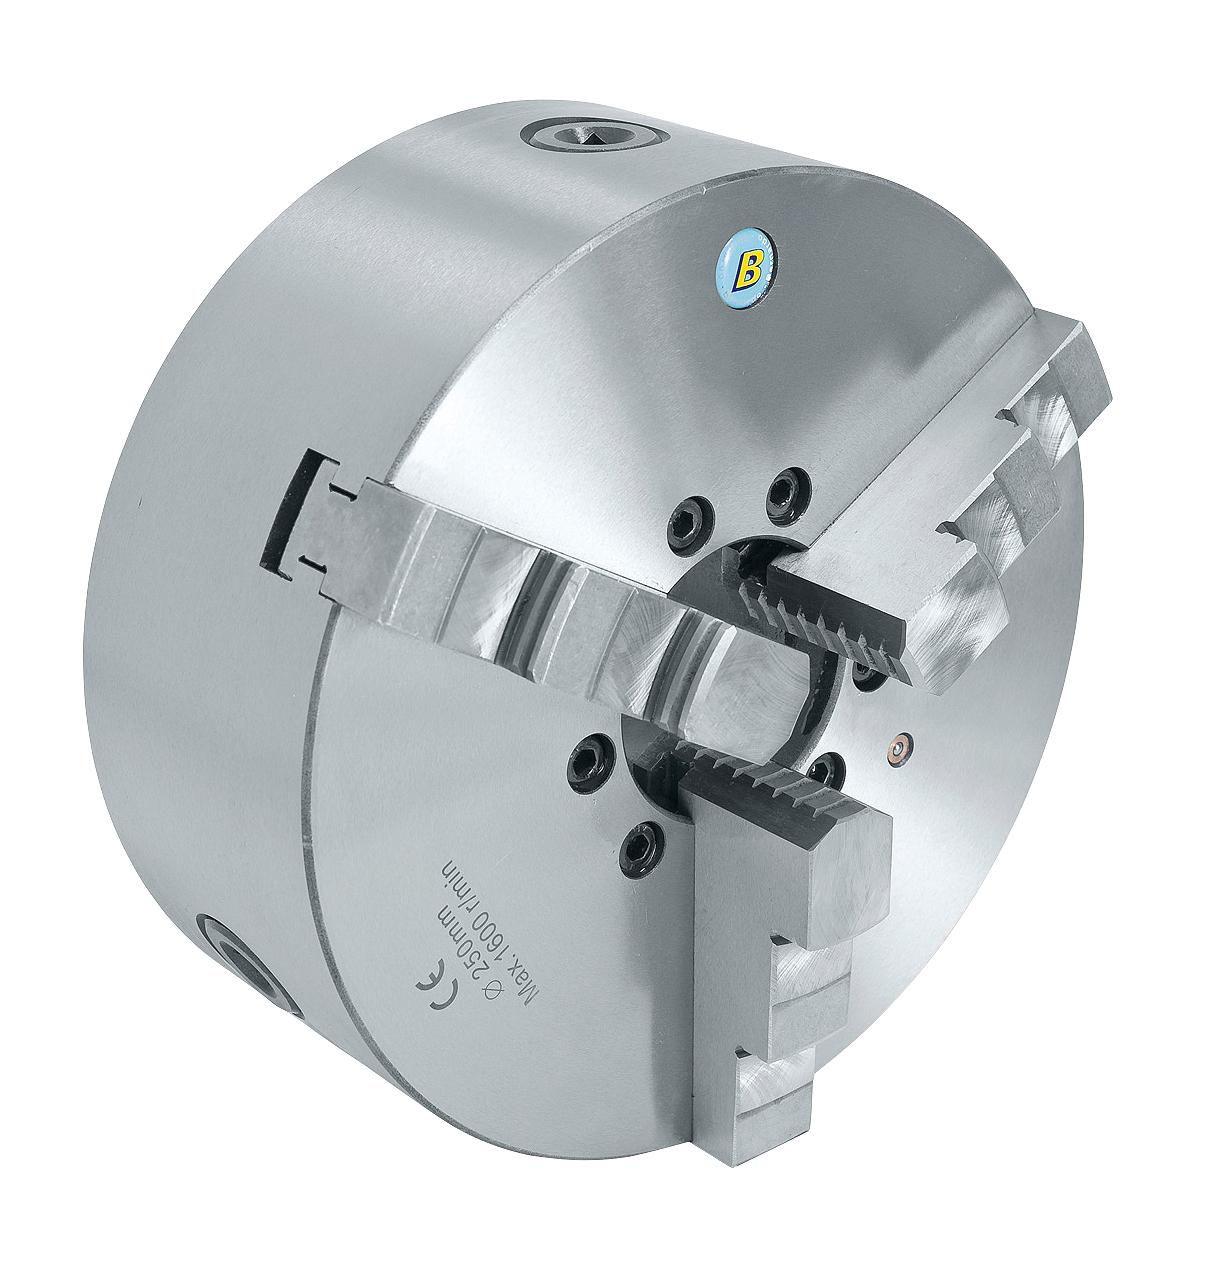 3 bakket centrerpatron standard DK11-315/D11